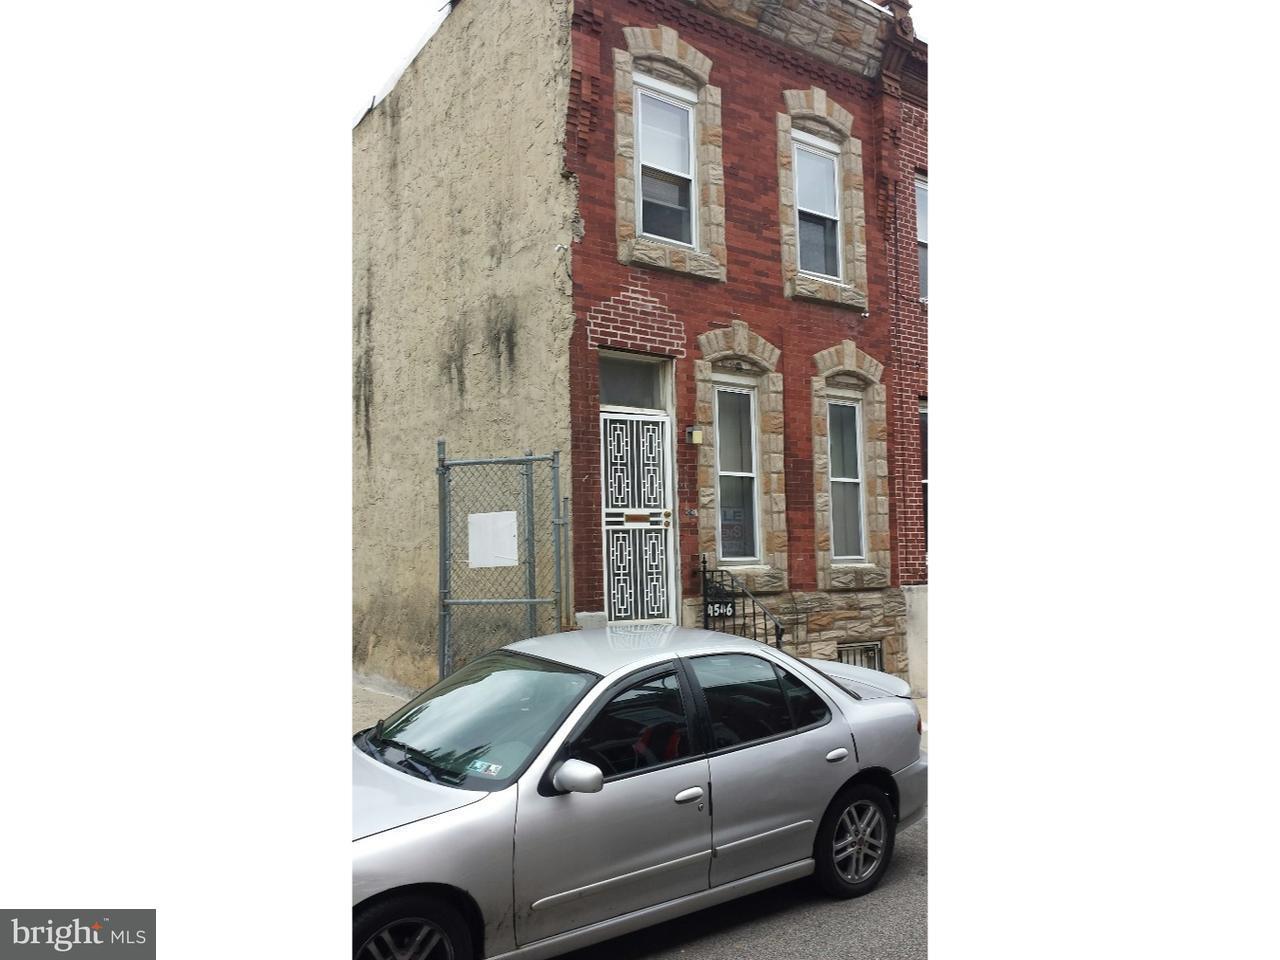 4546 N Bouvier Philadelphia, PA 19140